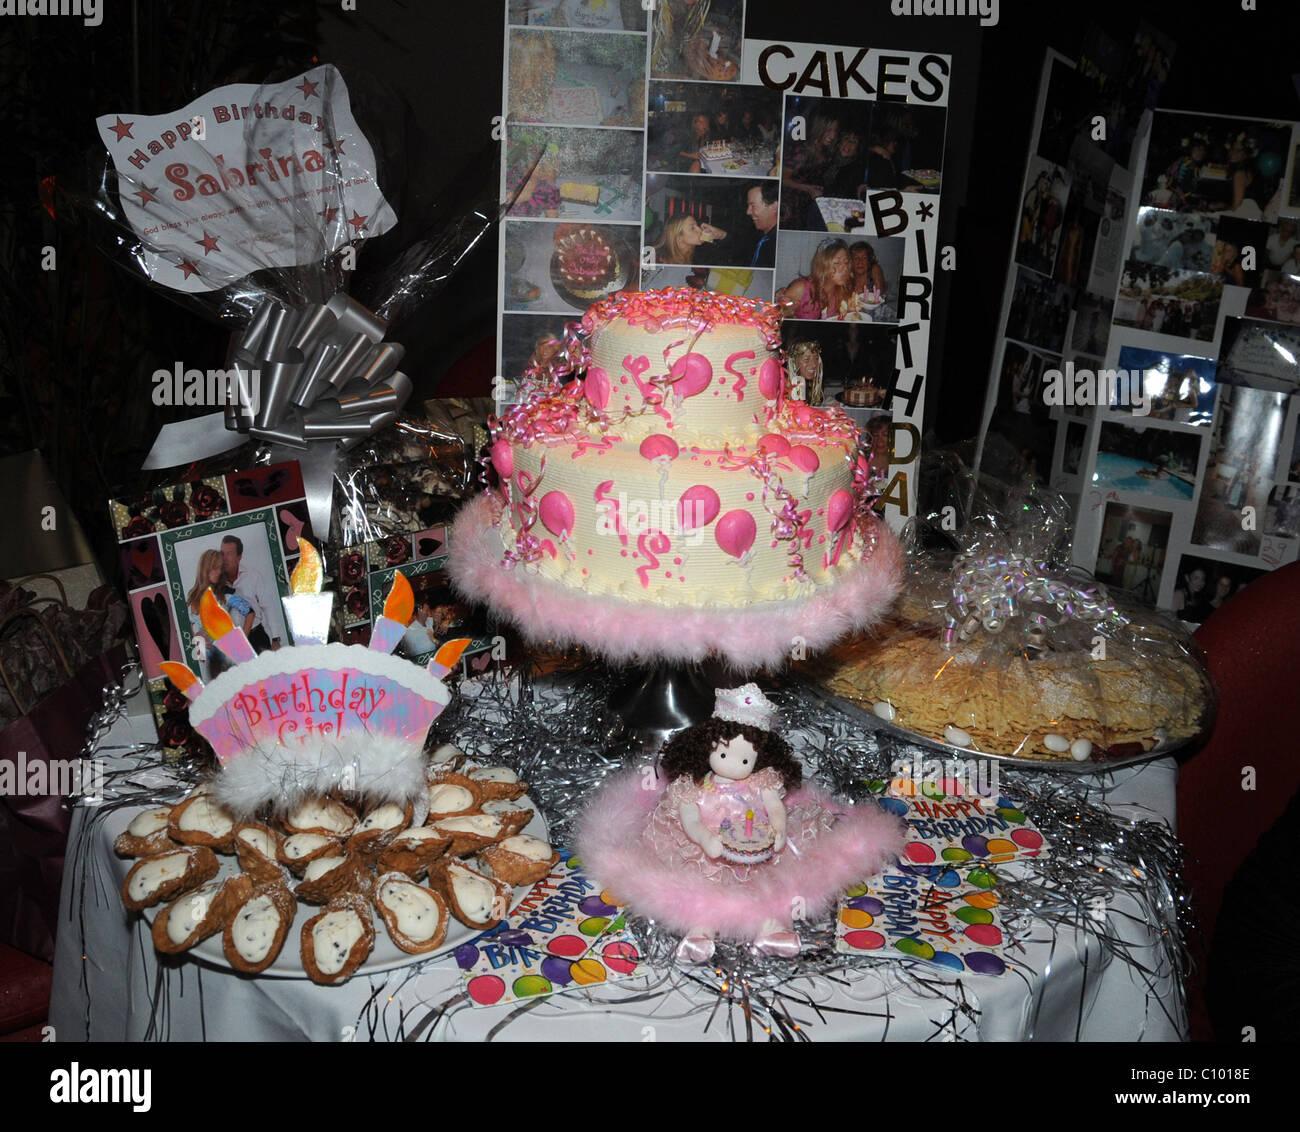 Pleasing Atmosphere Birthday Cake At Socialite Sambrina Tamburino Funny Birthday Cards Online Inifodamsfinfo